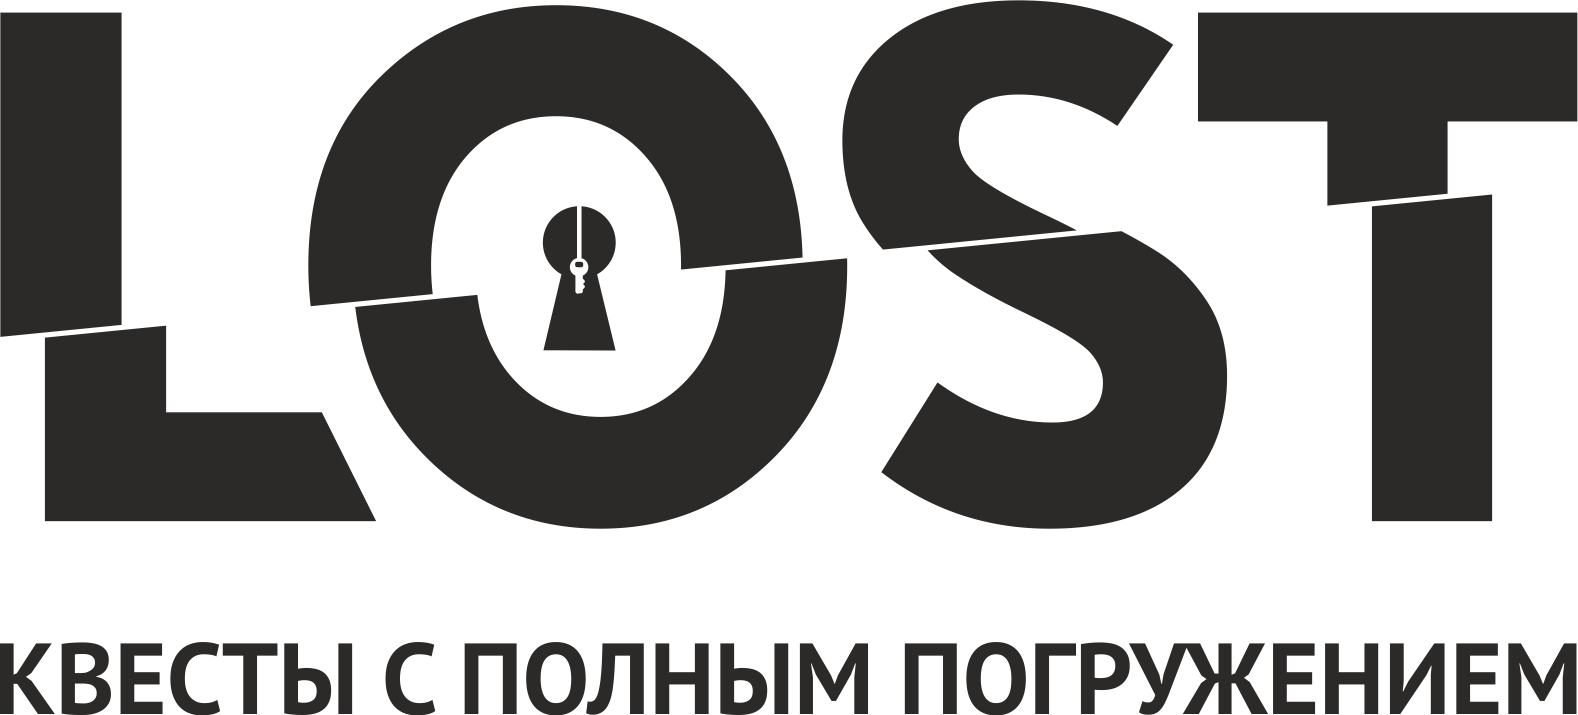 Lost Quests  — квесты в Москве